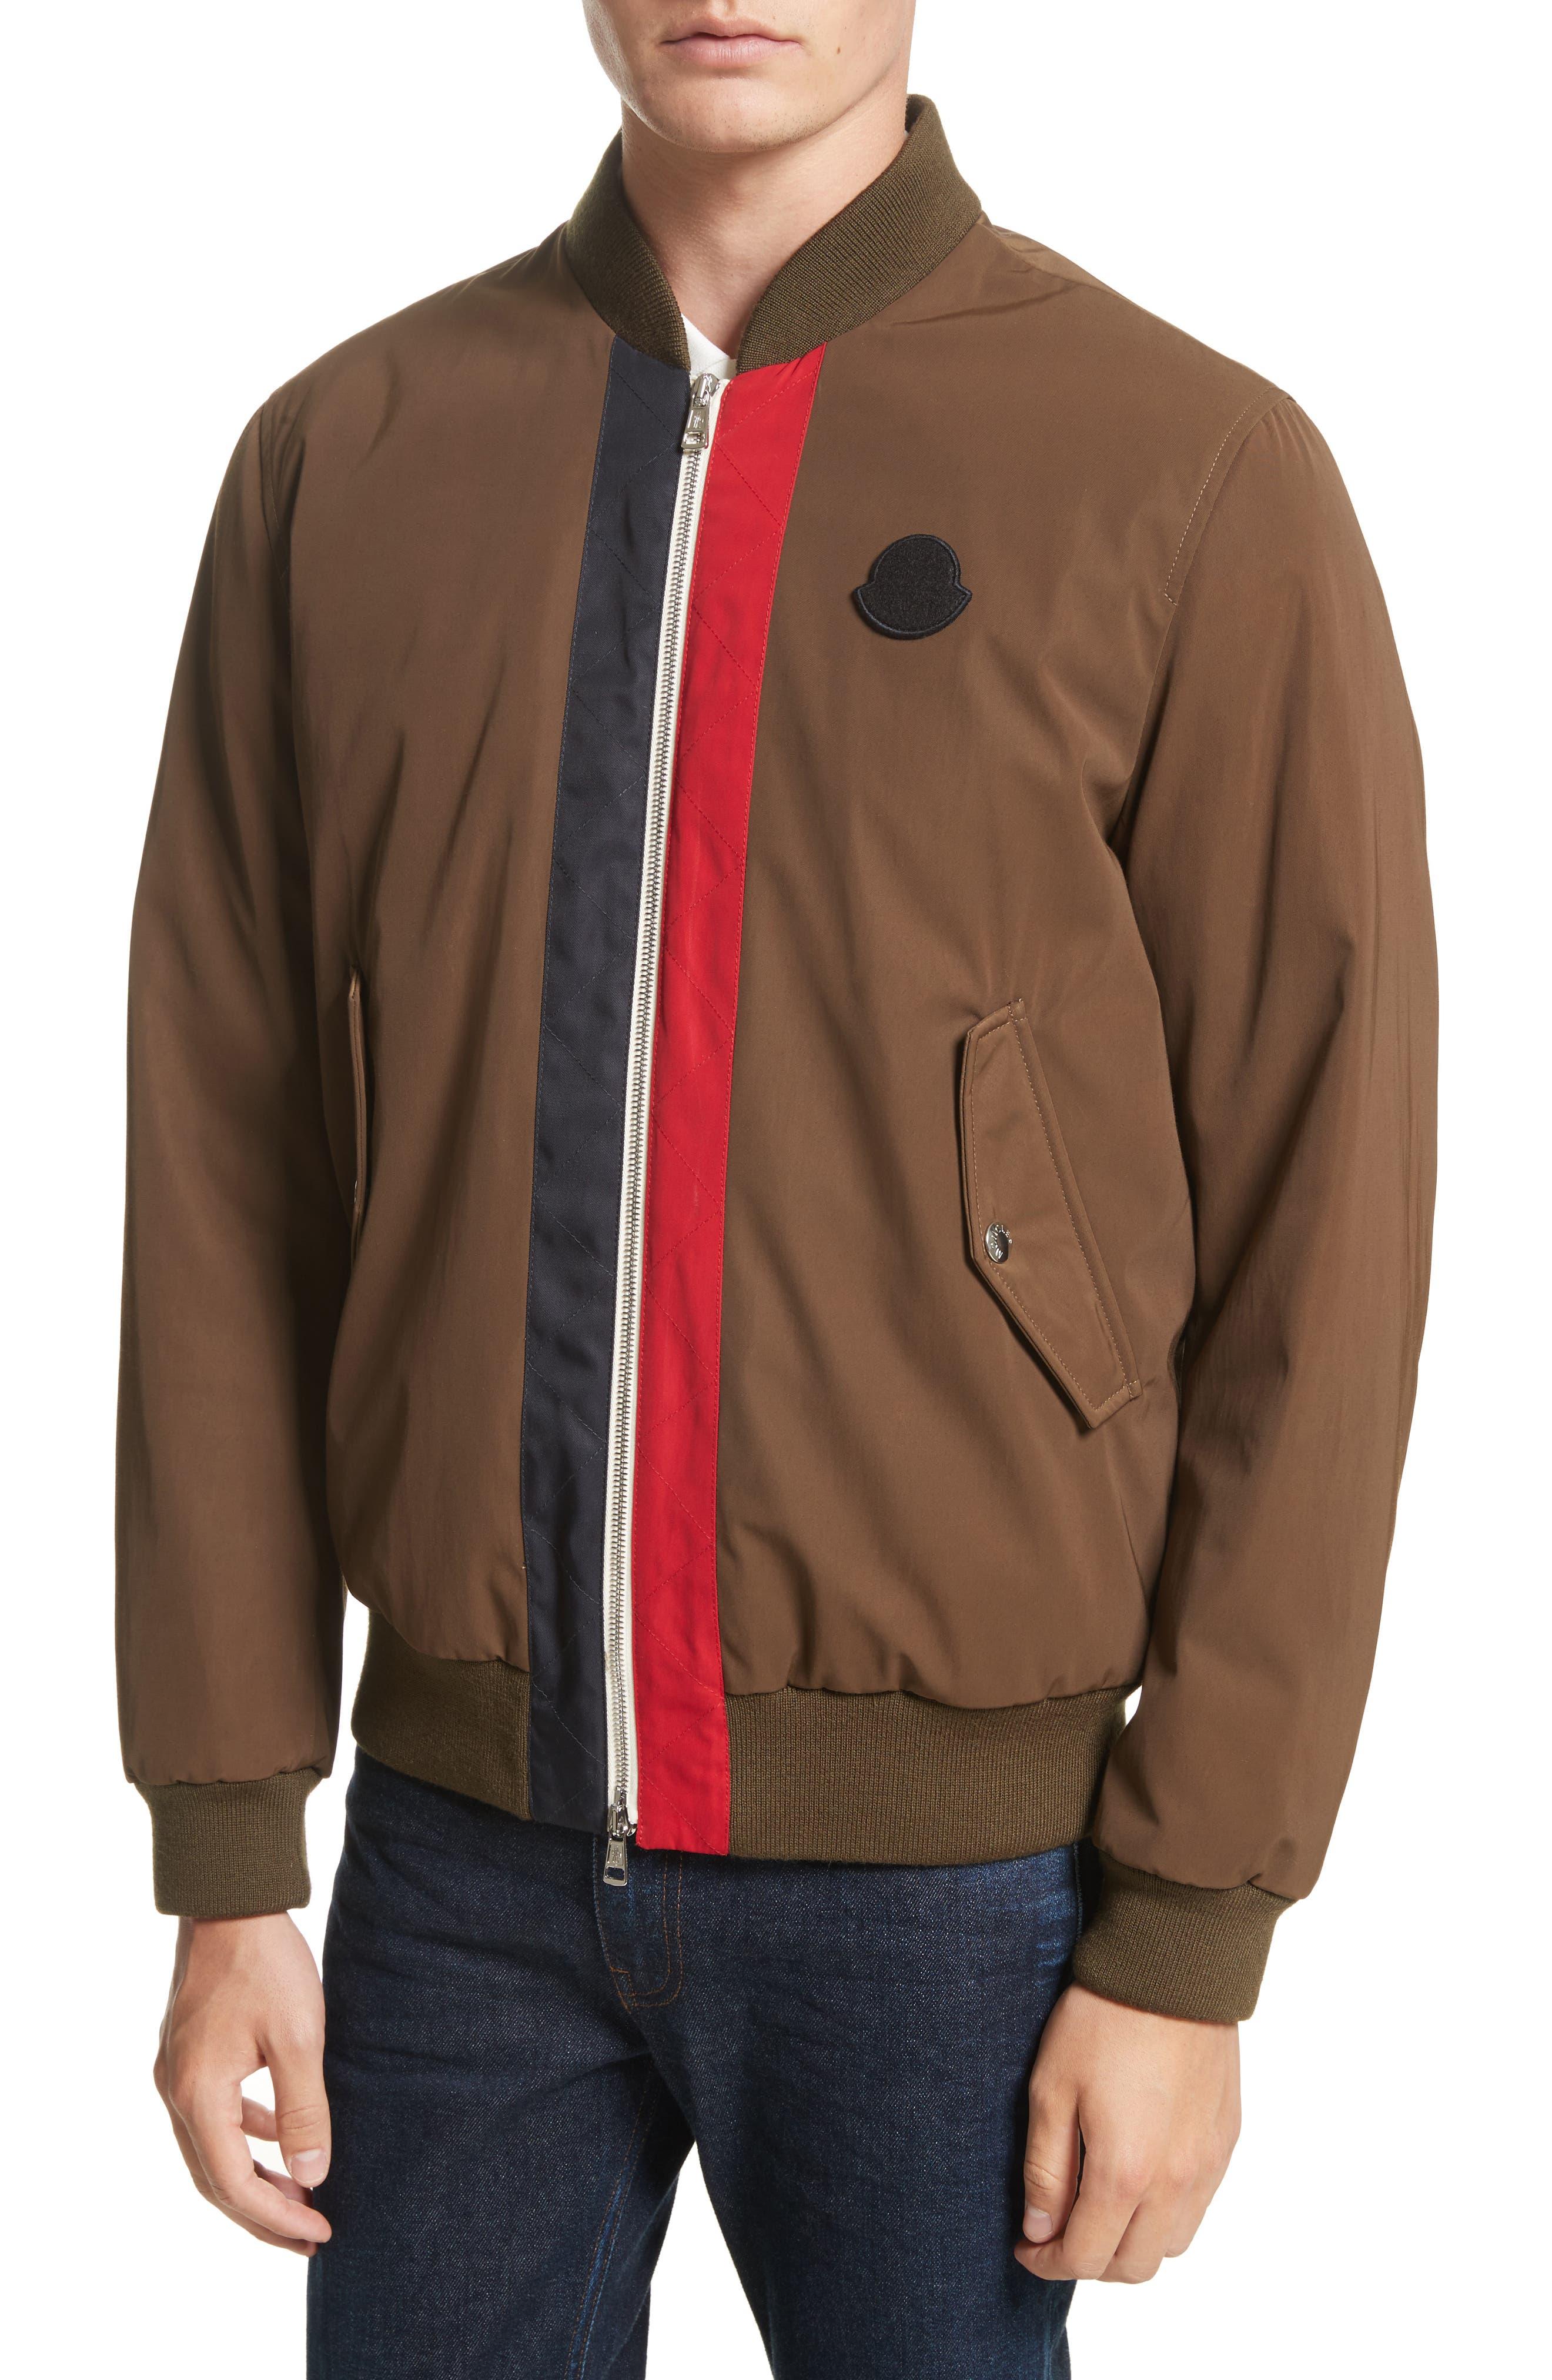 Tacna Stripe Bomber Jacket,                             Alternate thumbnail 4, color,                             300